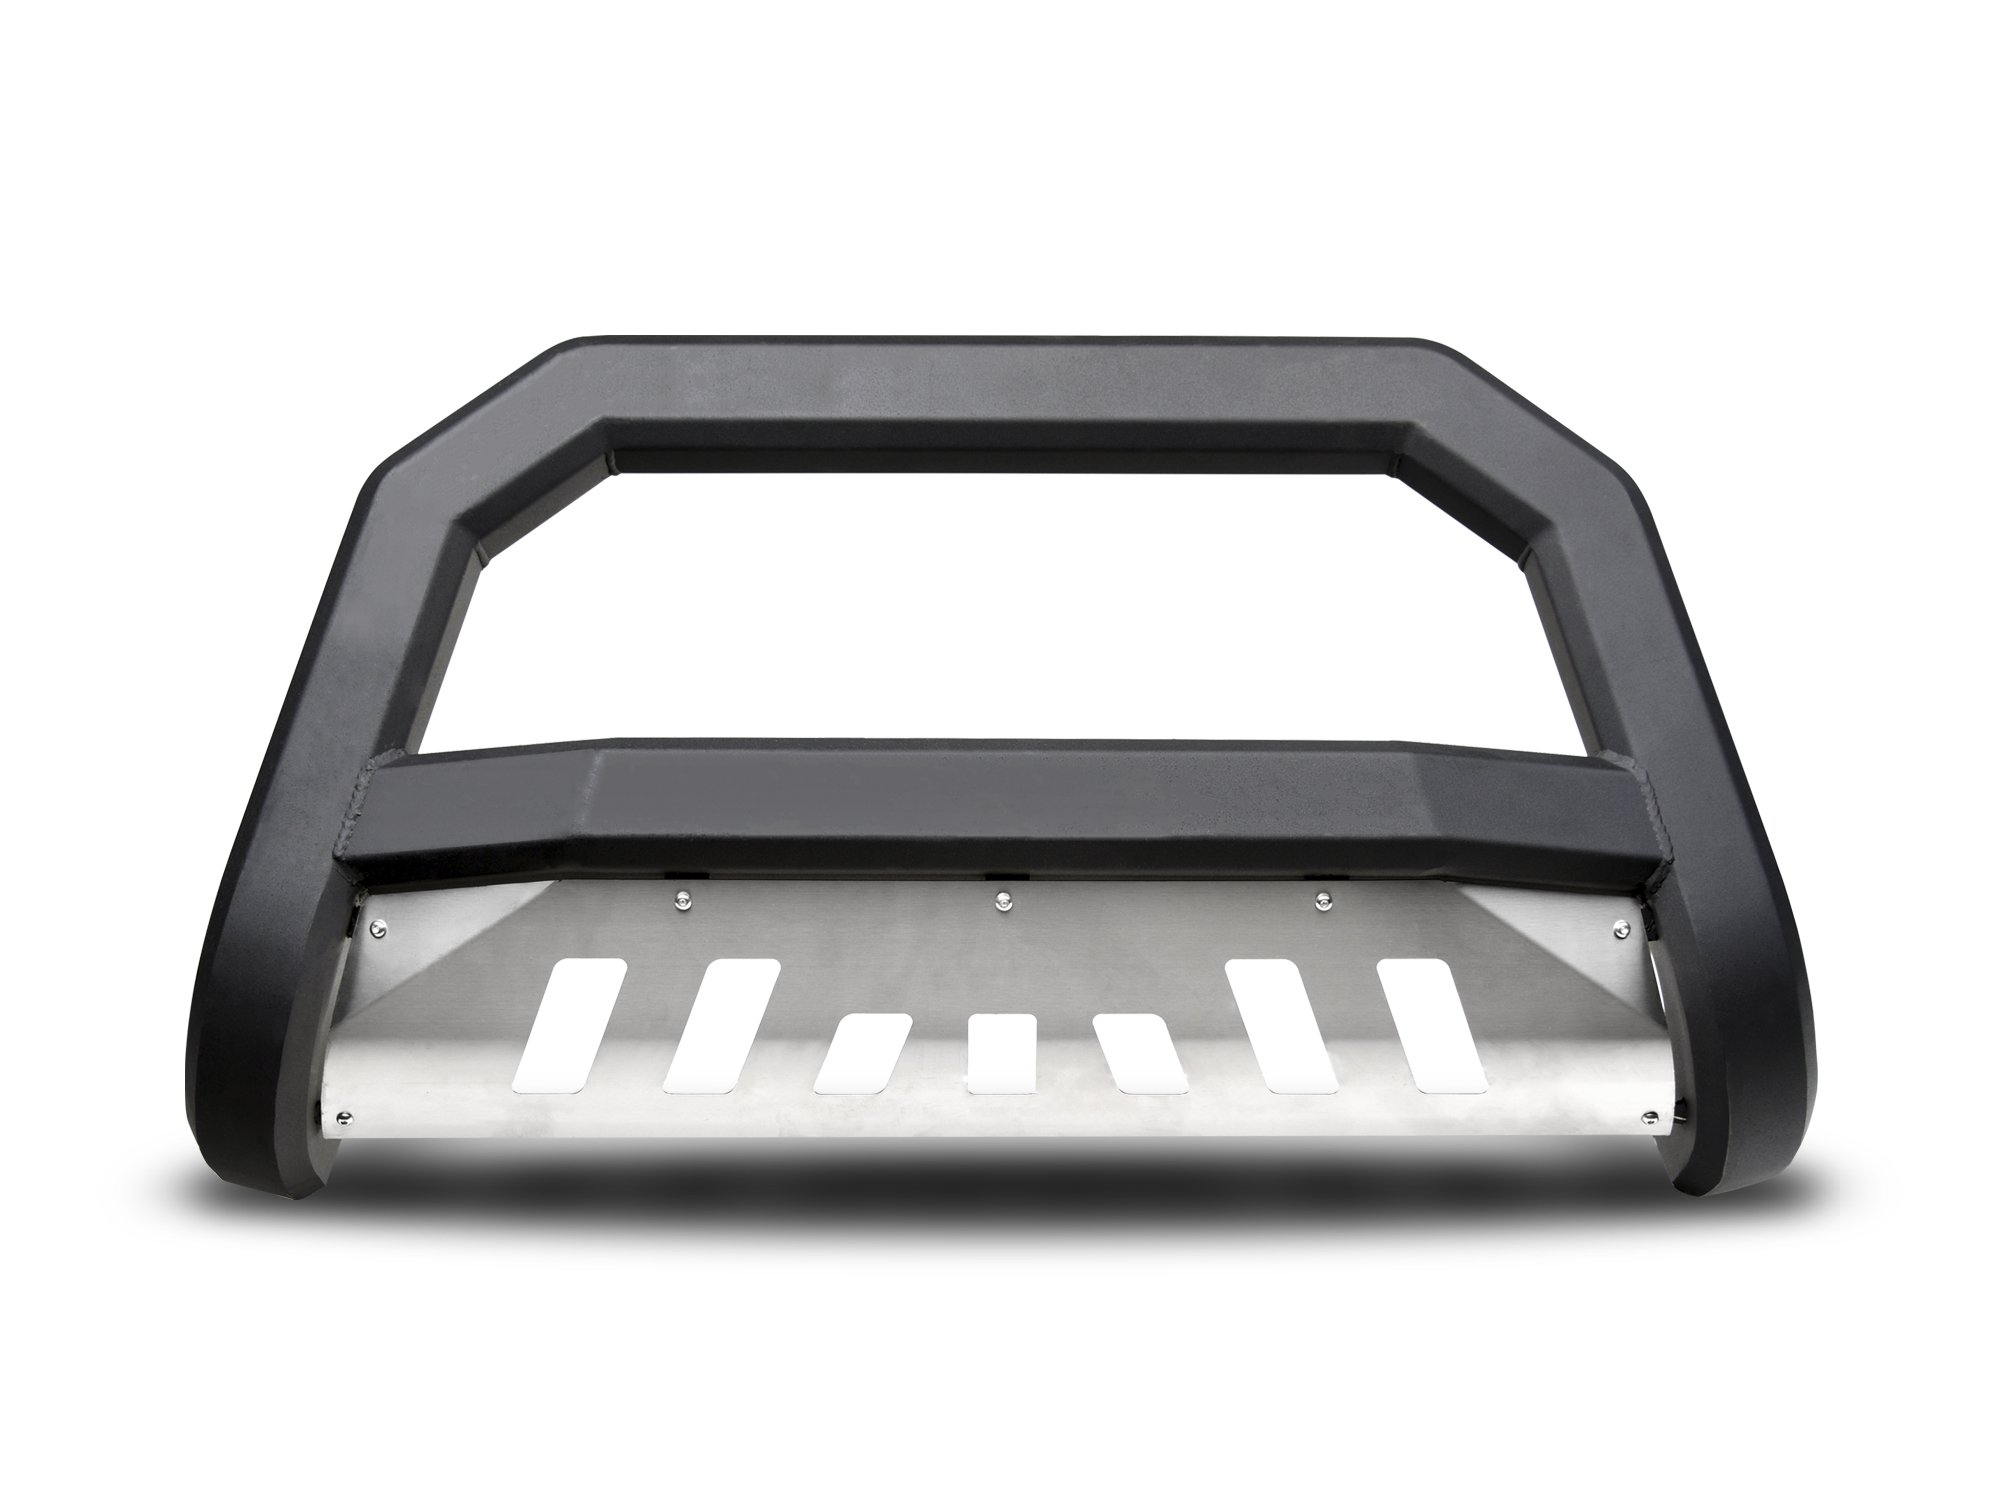 Armordillo USA 7170148 AR Series Bull Bar Fits 2007-2019 Toyota Tundra - Matte Black W/Aluminum Skid Plate